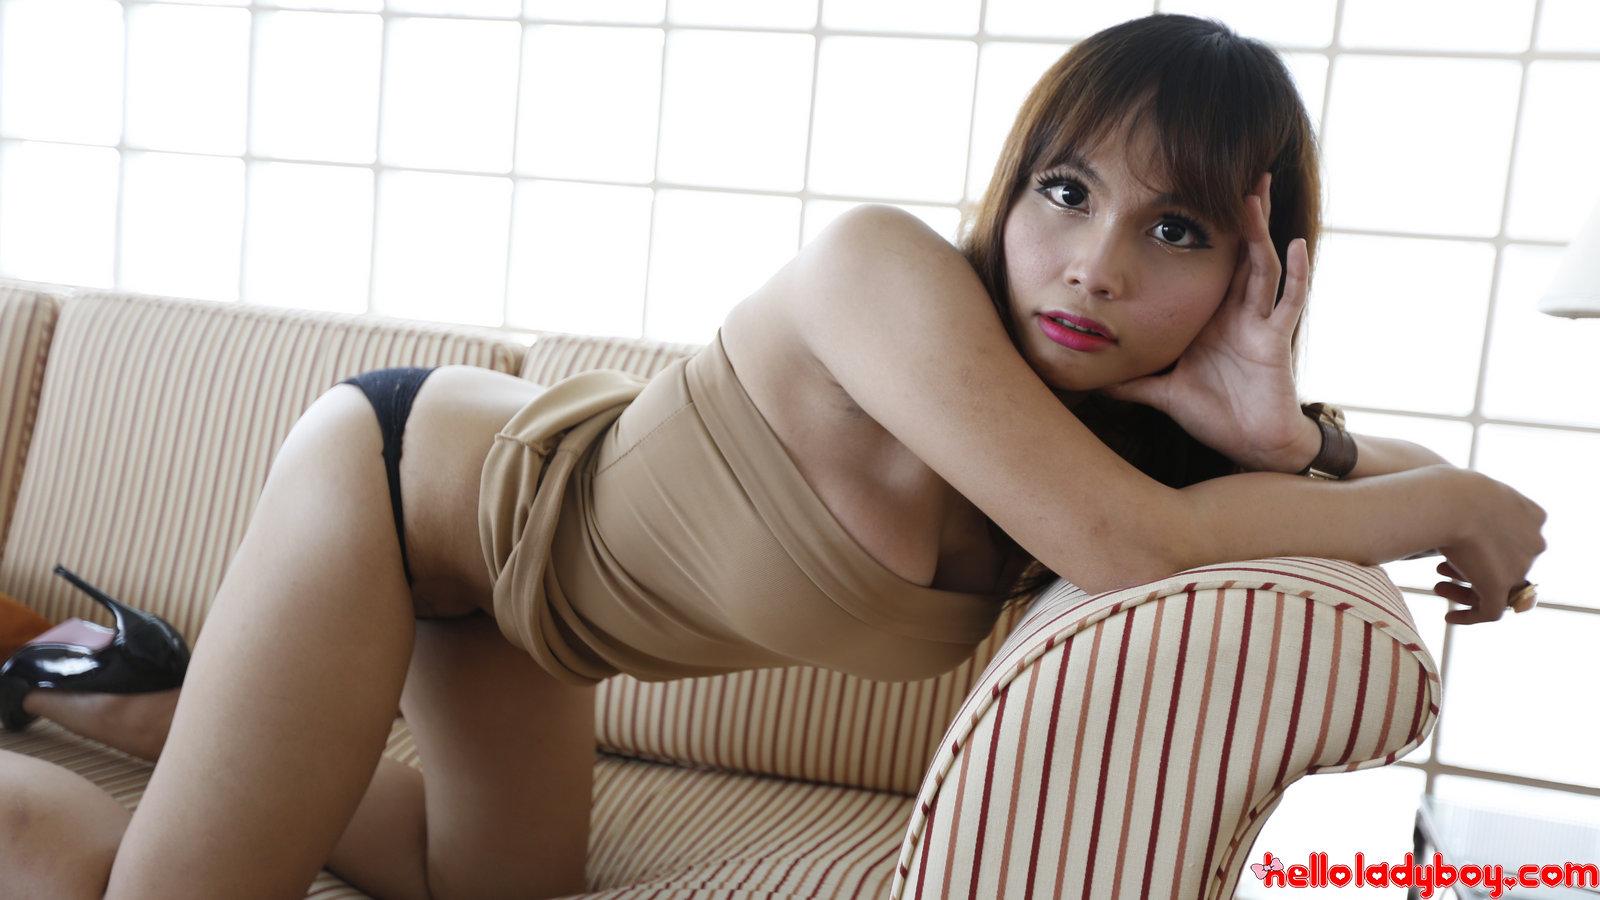 Ja Ladyboy порно модель